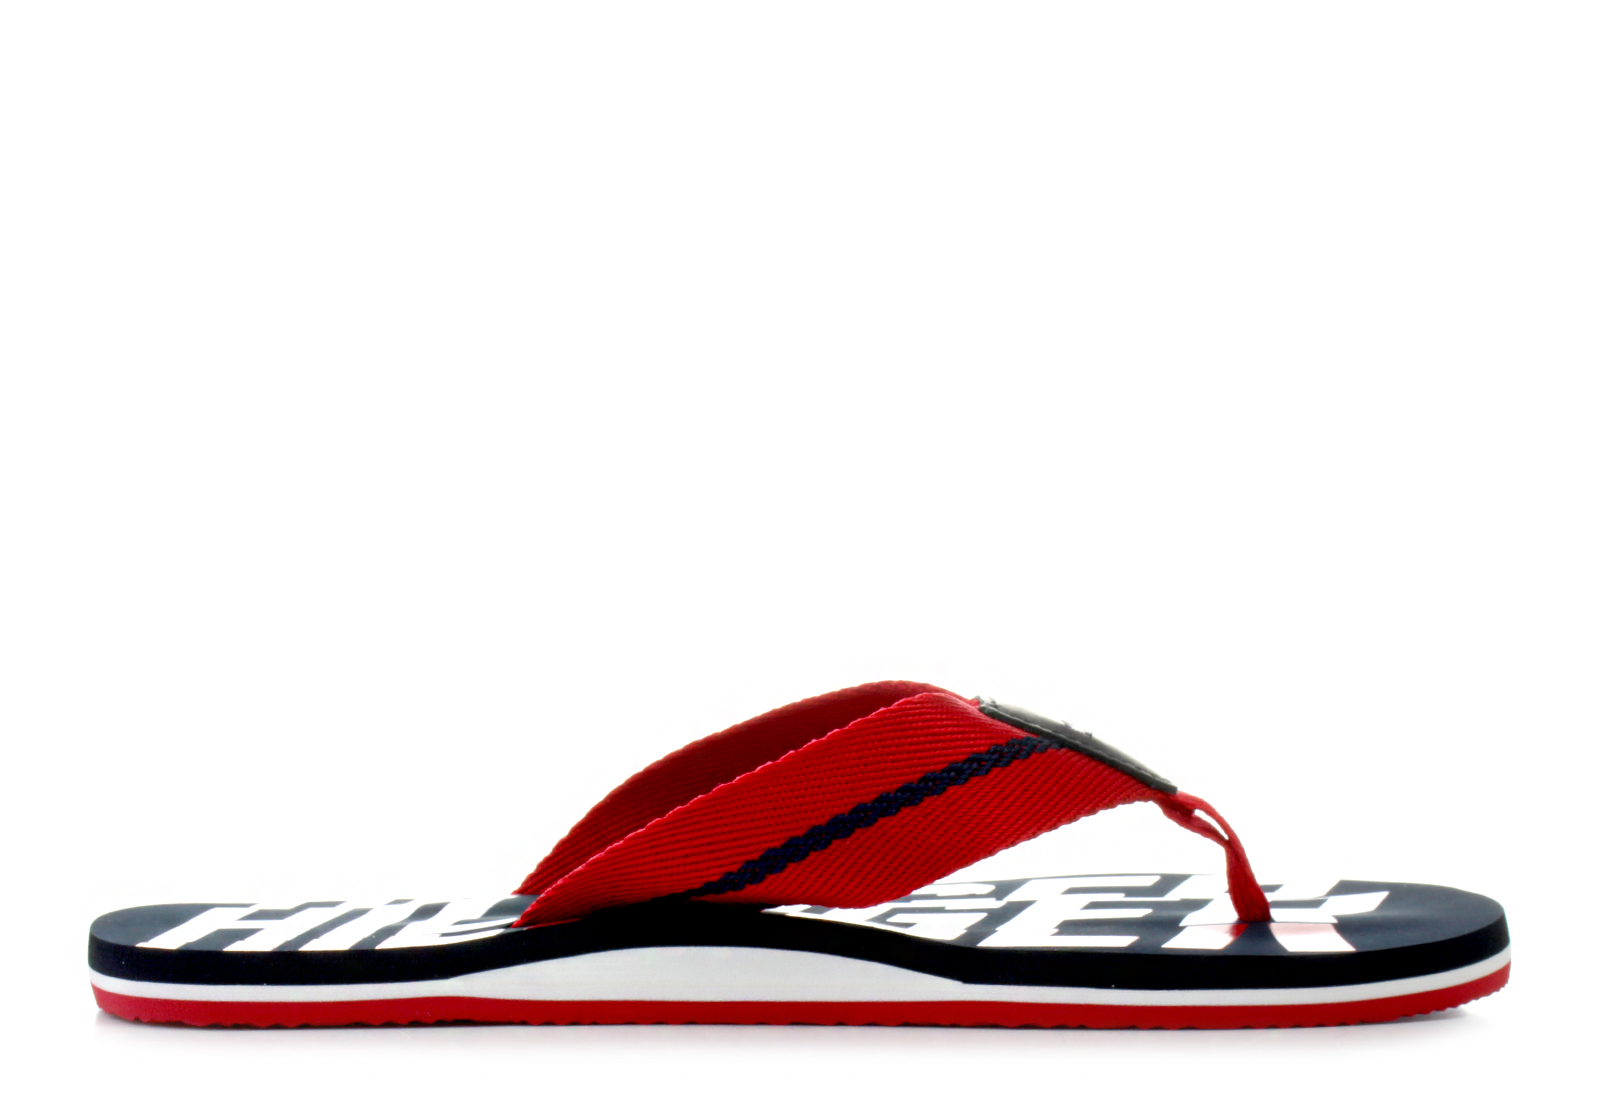 e7c1ee41fc Tommy Hilfiger Papucs - Floyd 21 - 18S-1367-611 - Office Shoes ...